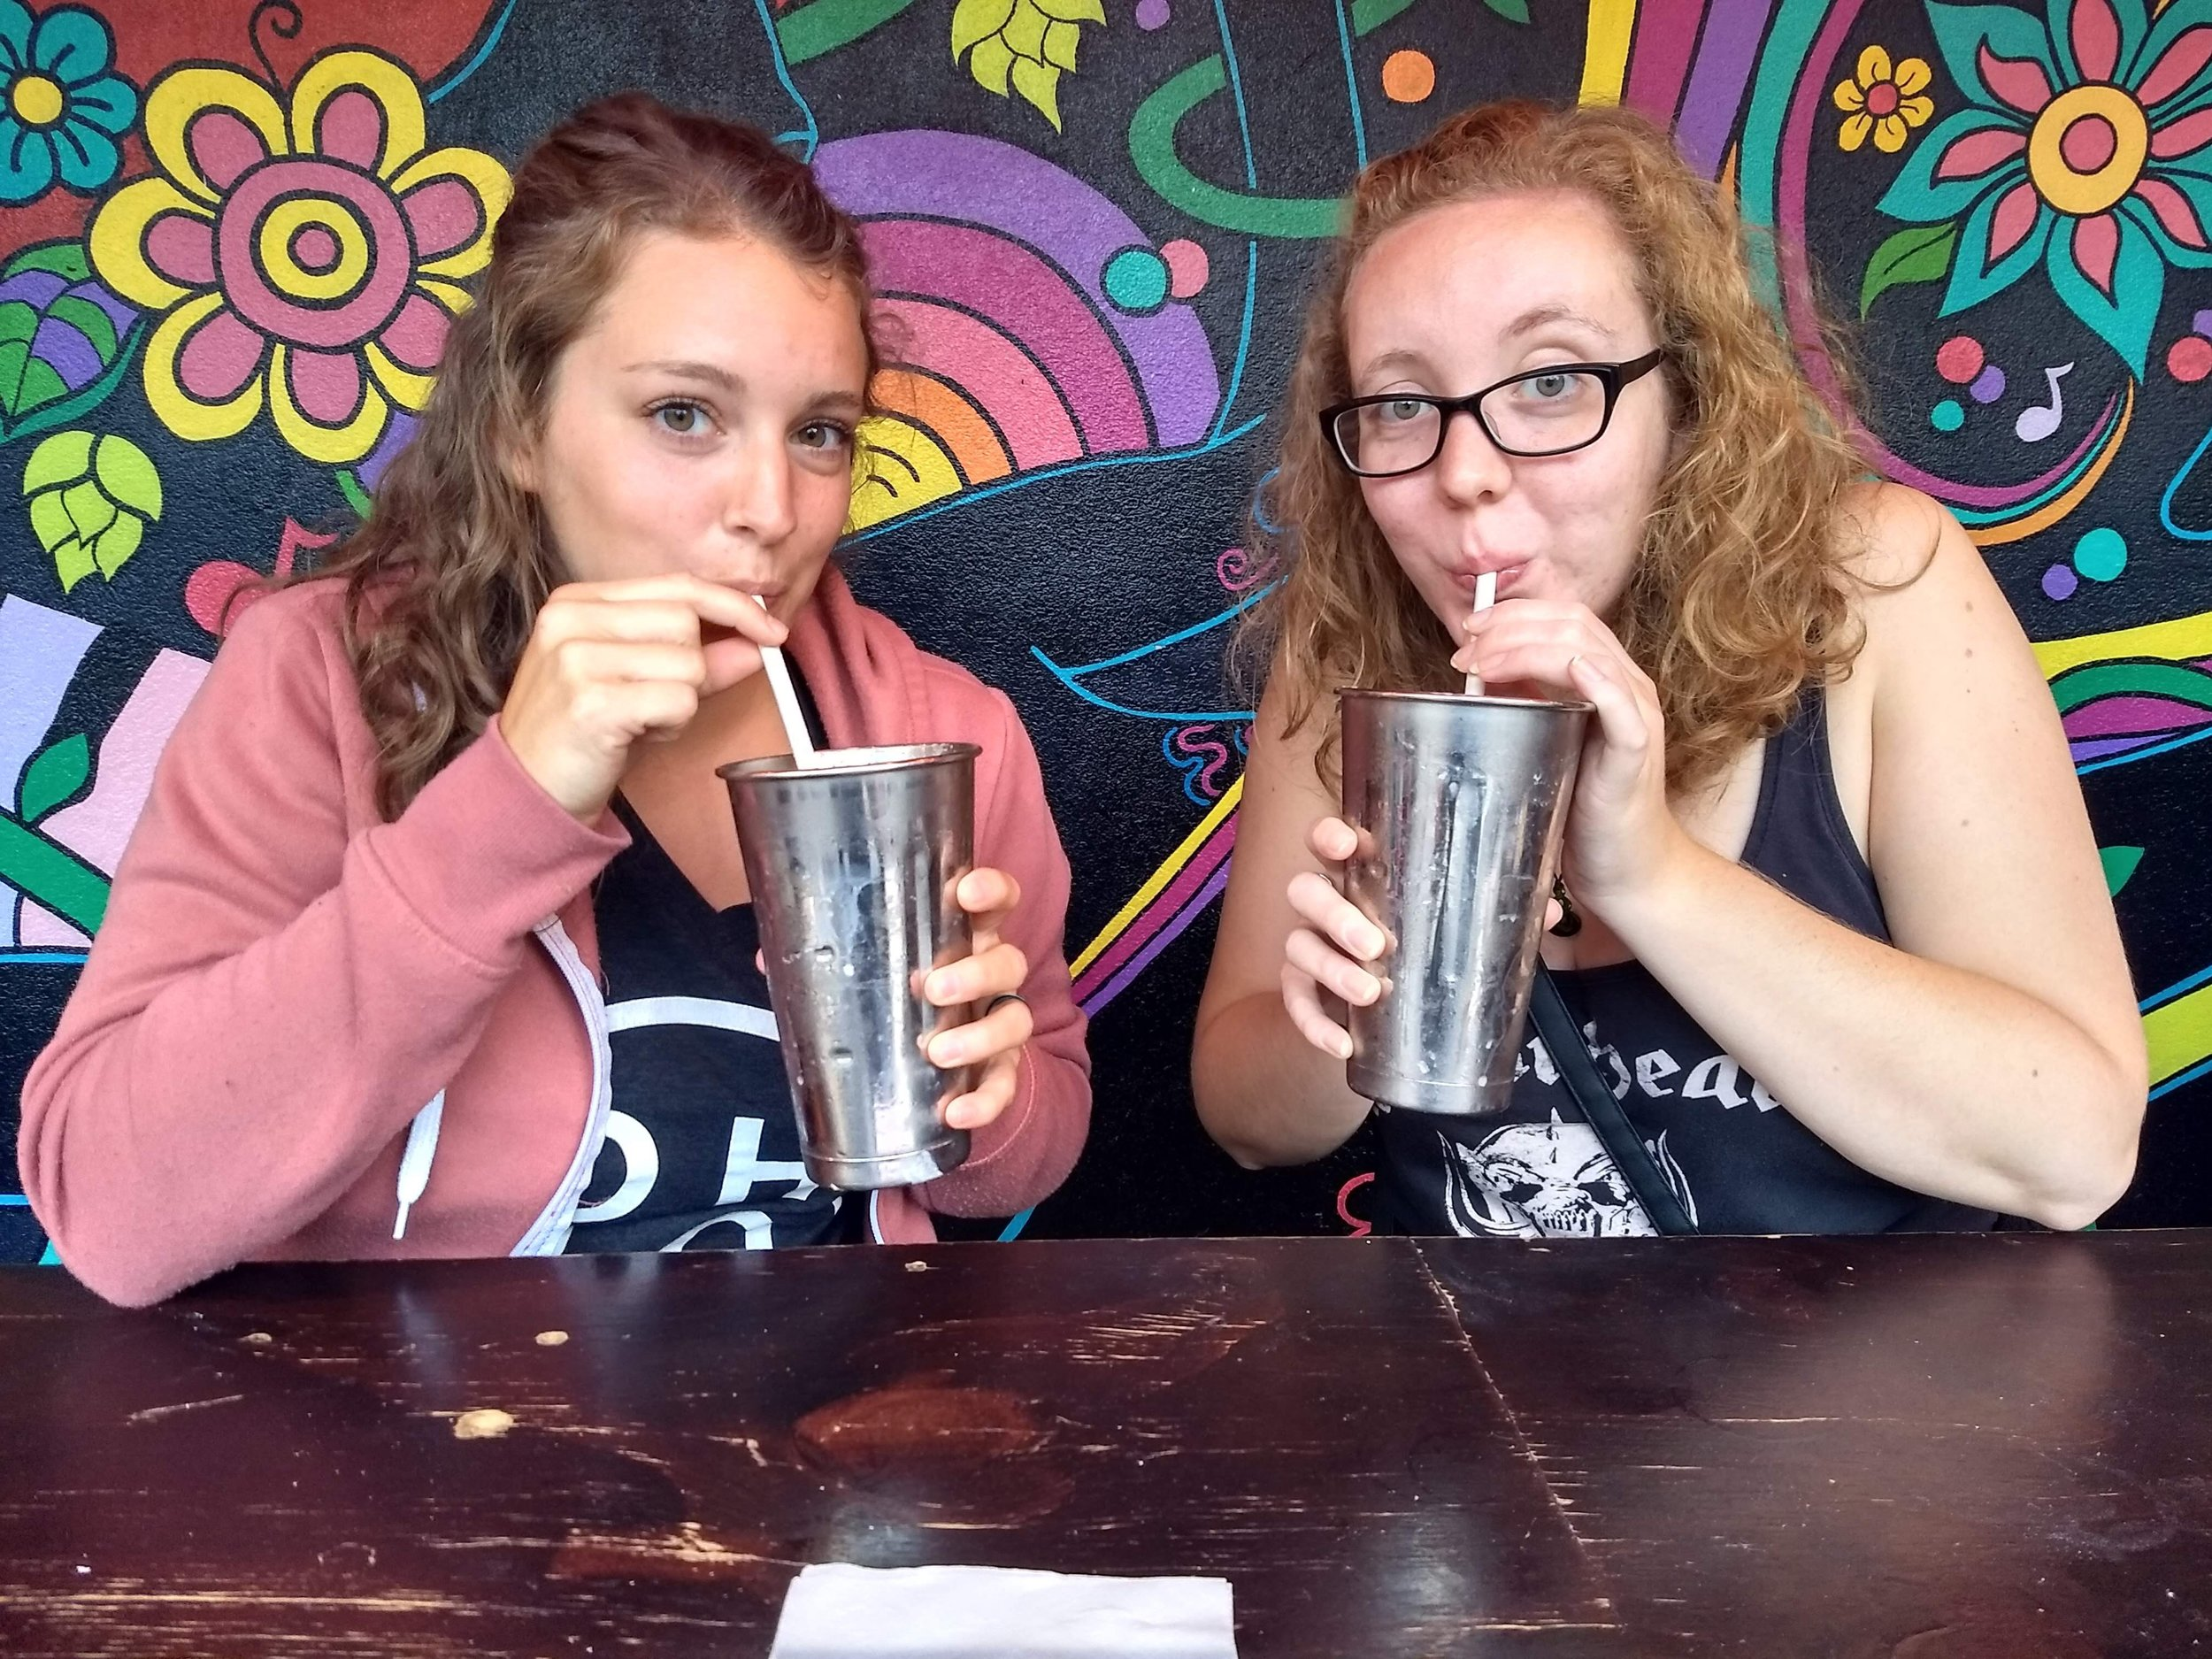 Yummy milkshakes with our friend Sam!!